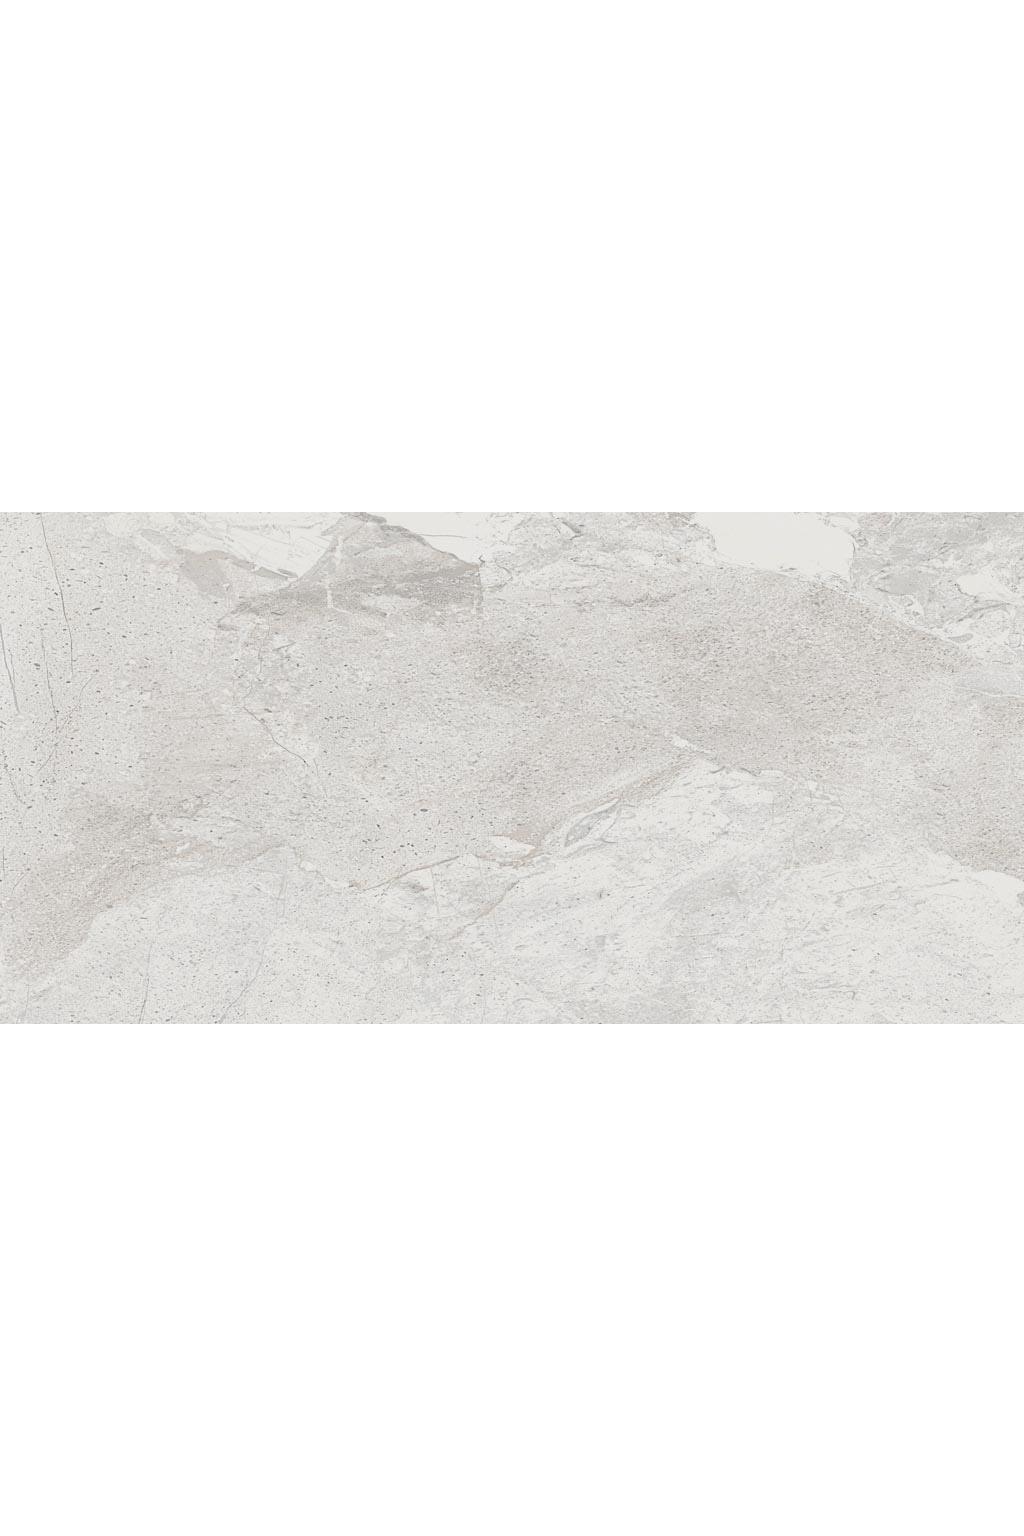 Beach White Sand Stone Effect Porcelain Tile 308mm X 615mm